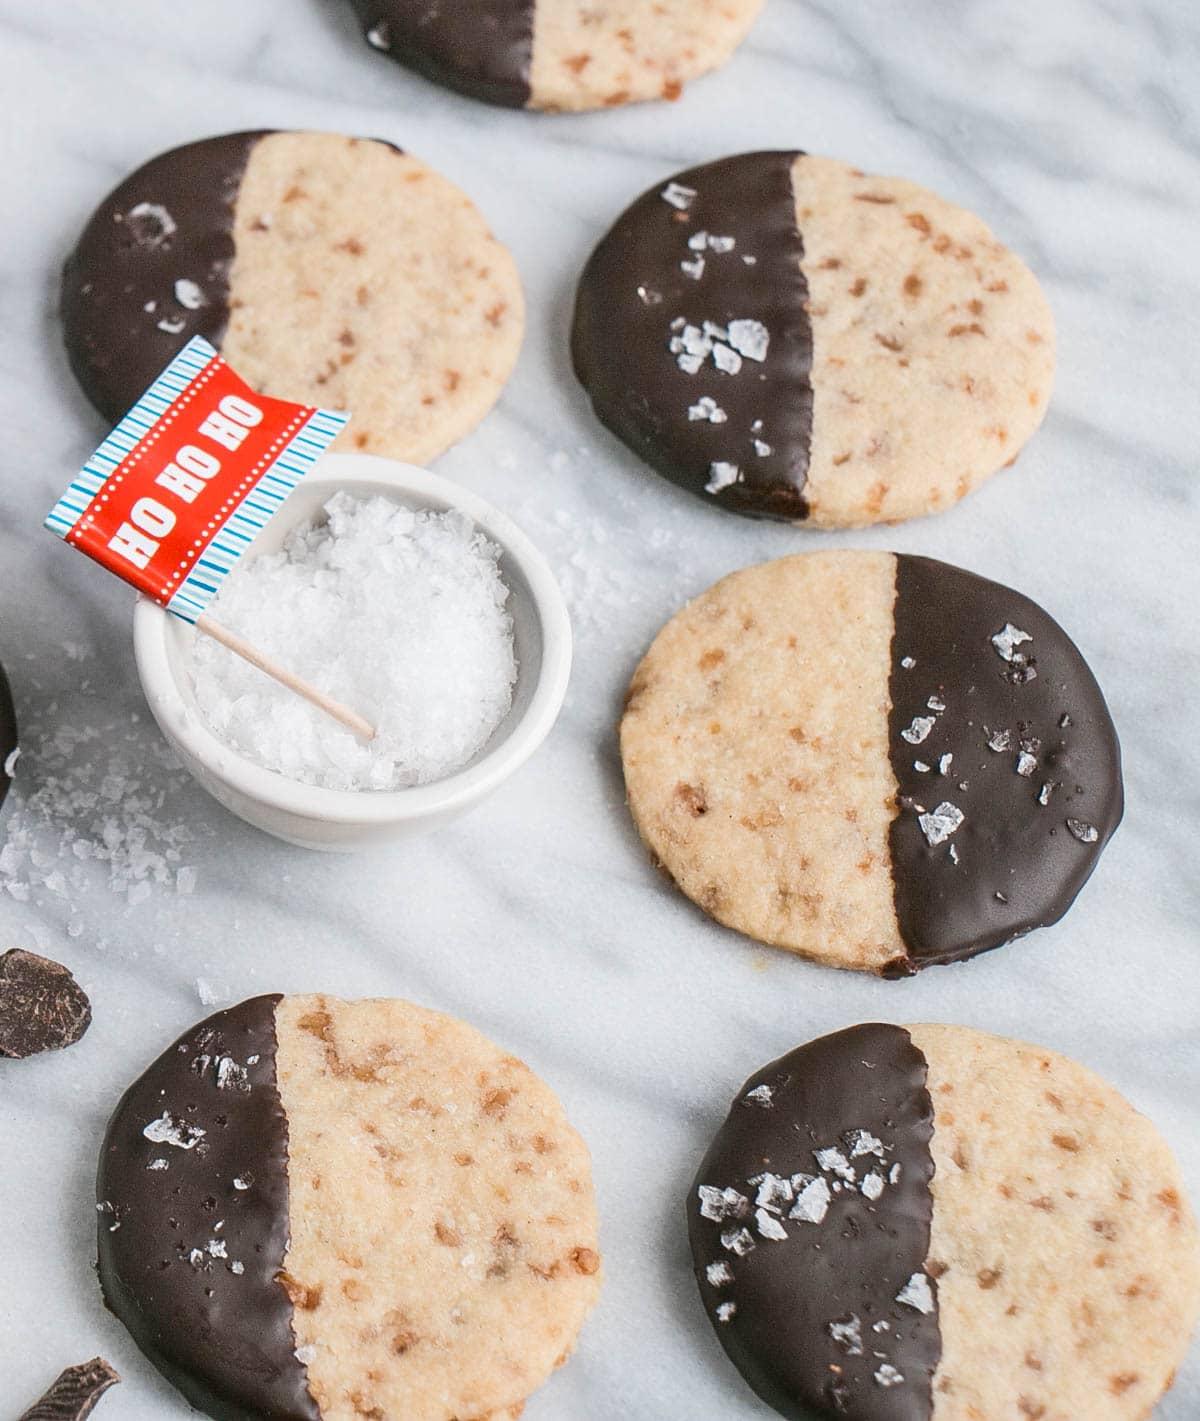 Dark Chocolate Dipped Shortbread Cookies with Flaky Sea Salt